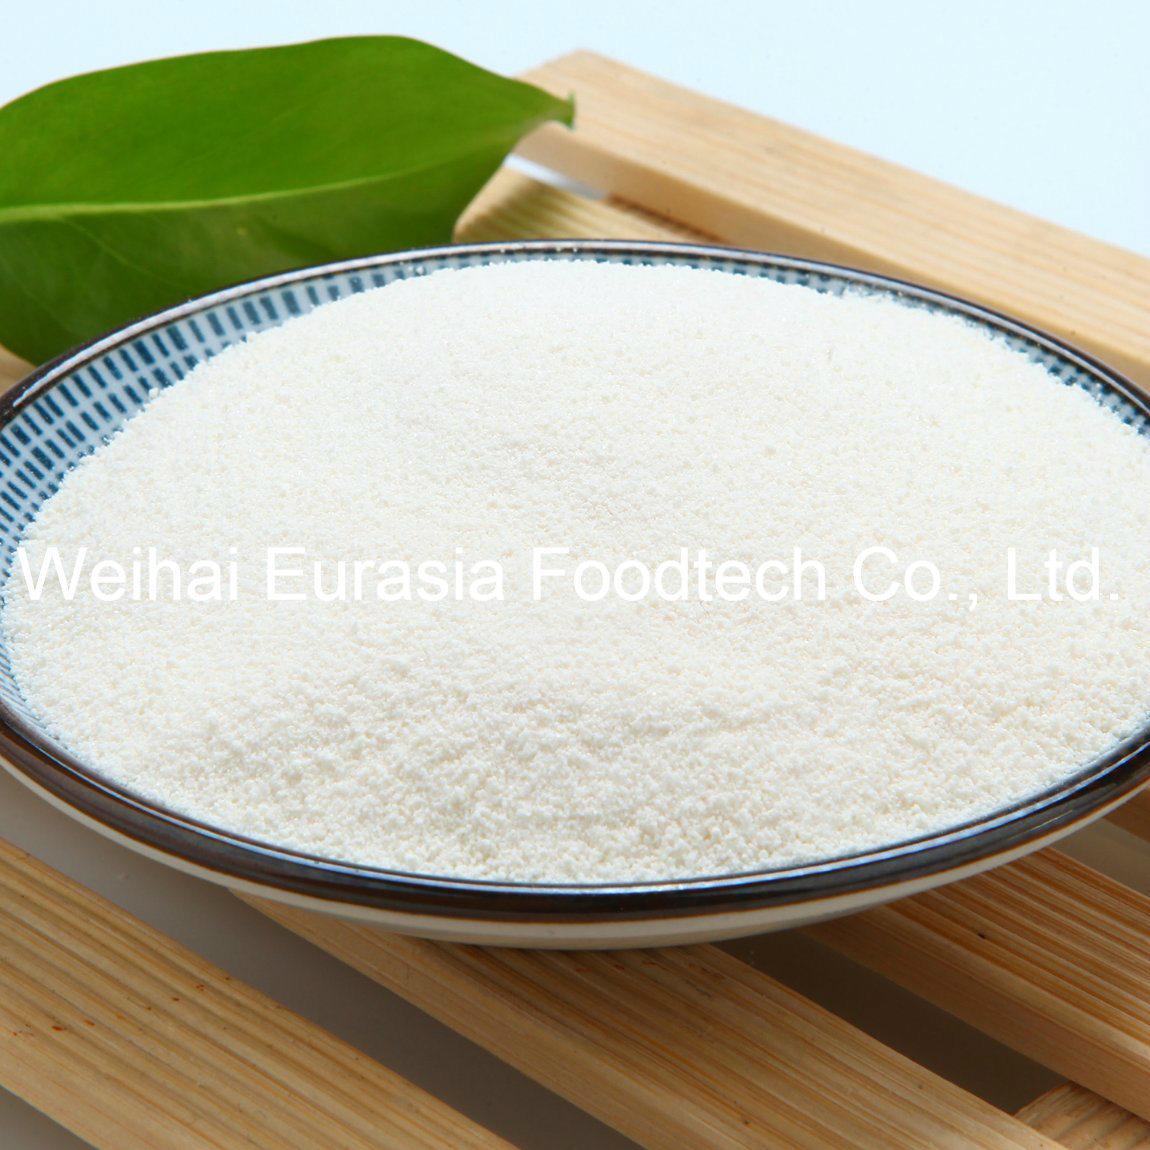 Vitamin Supplement Ascorbic Acid/Vitamin C 97% Granulation with Starch